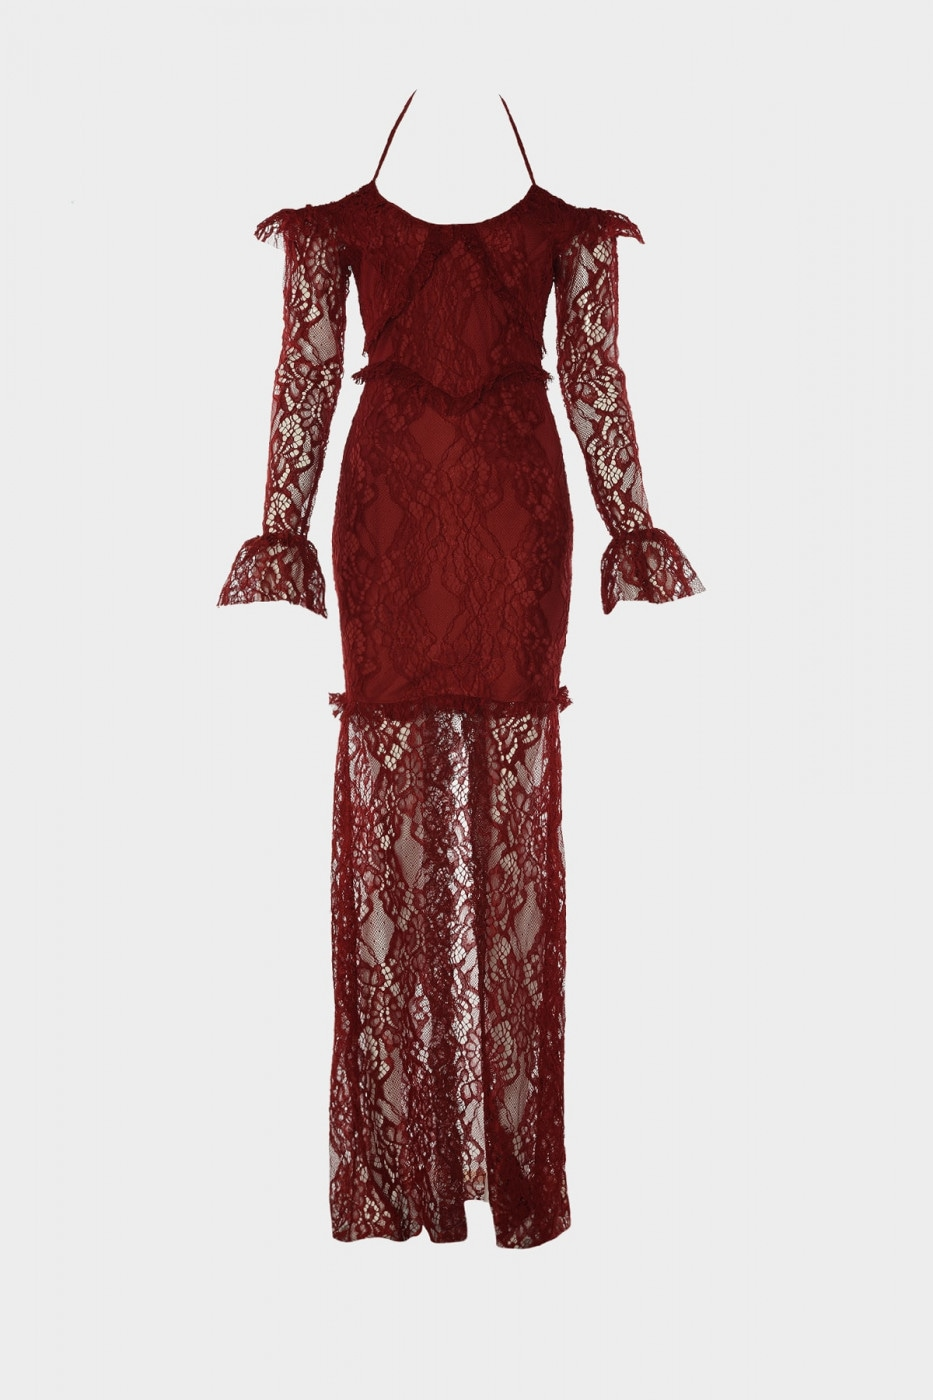 Trendyol Burgundy Drape Detailed Lace Evening Dress